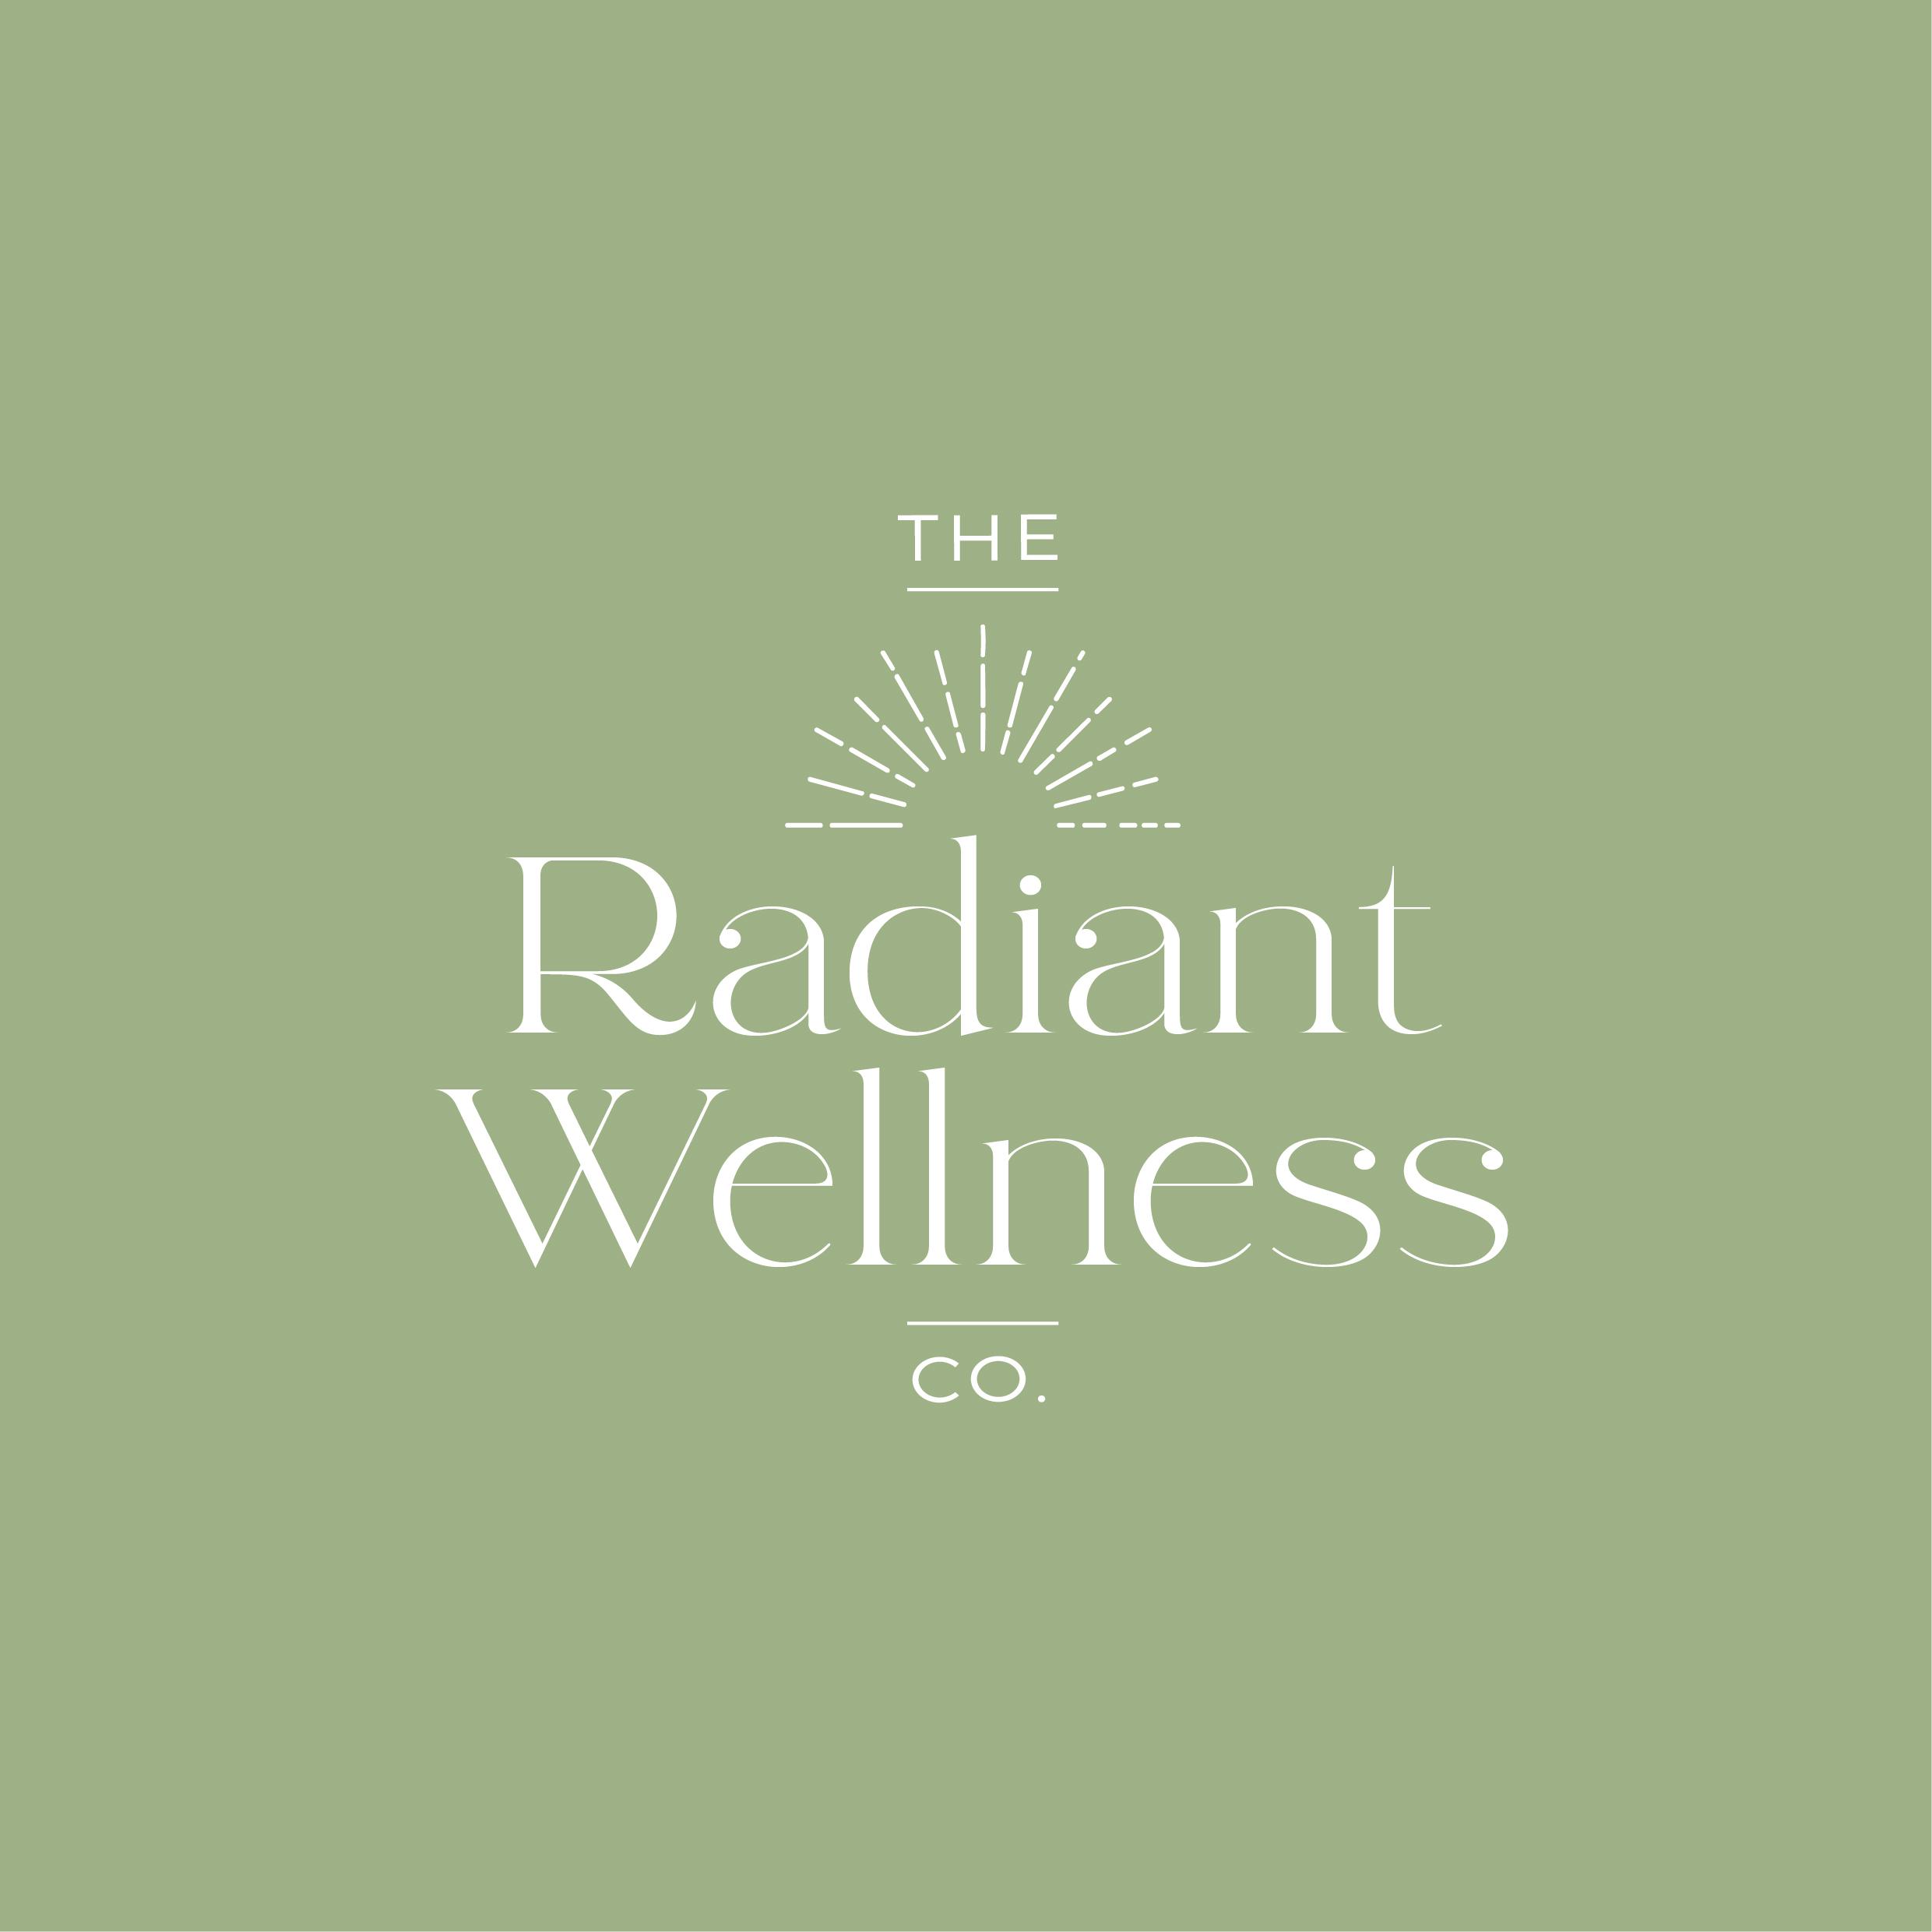 Radiant Wellness Premade Logo